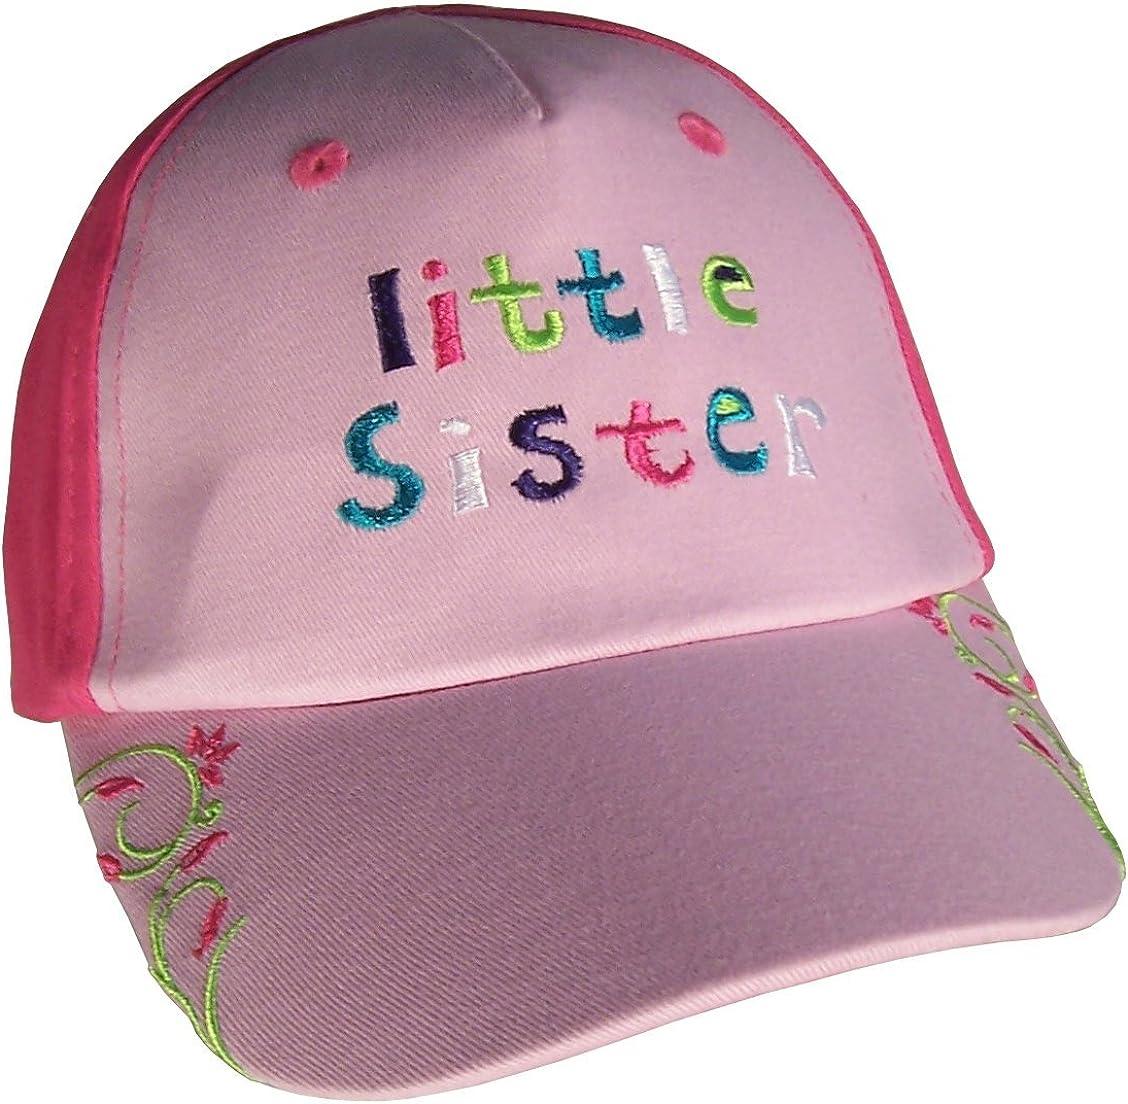 N 'iceキャップベビーガールズキュート刺繍キャップ ピンク/Fuchsia Little Sister 12-24 Months